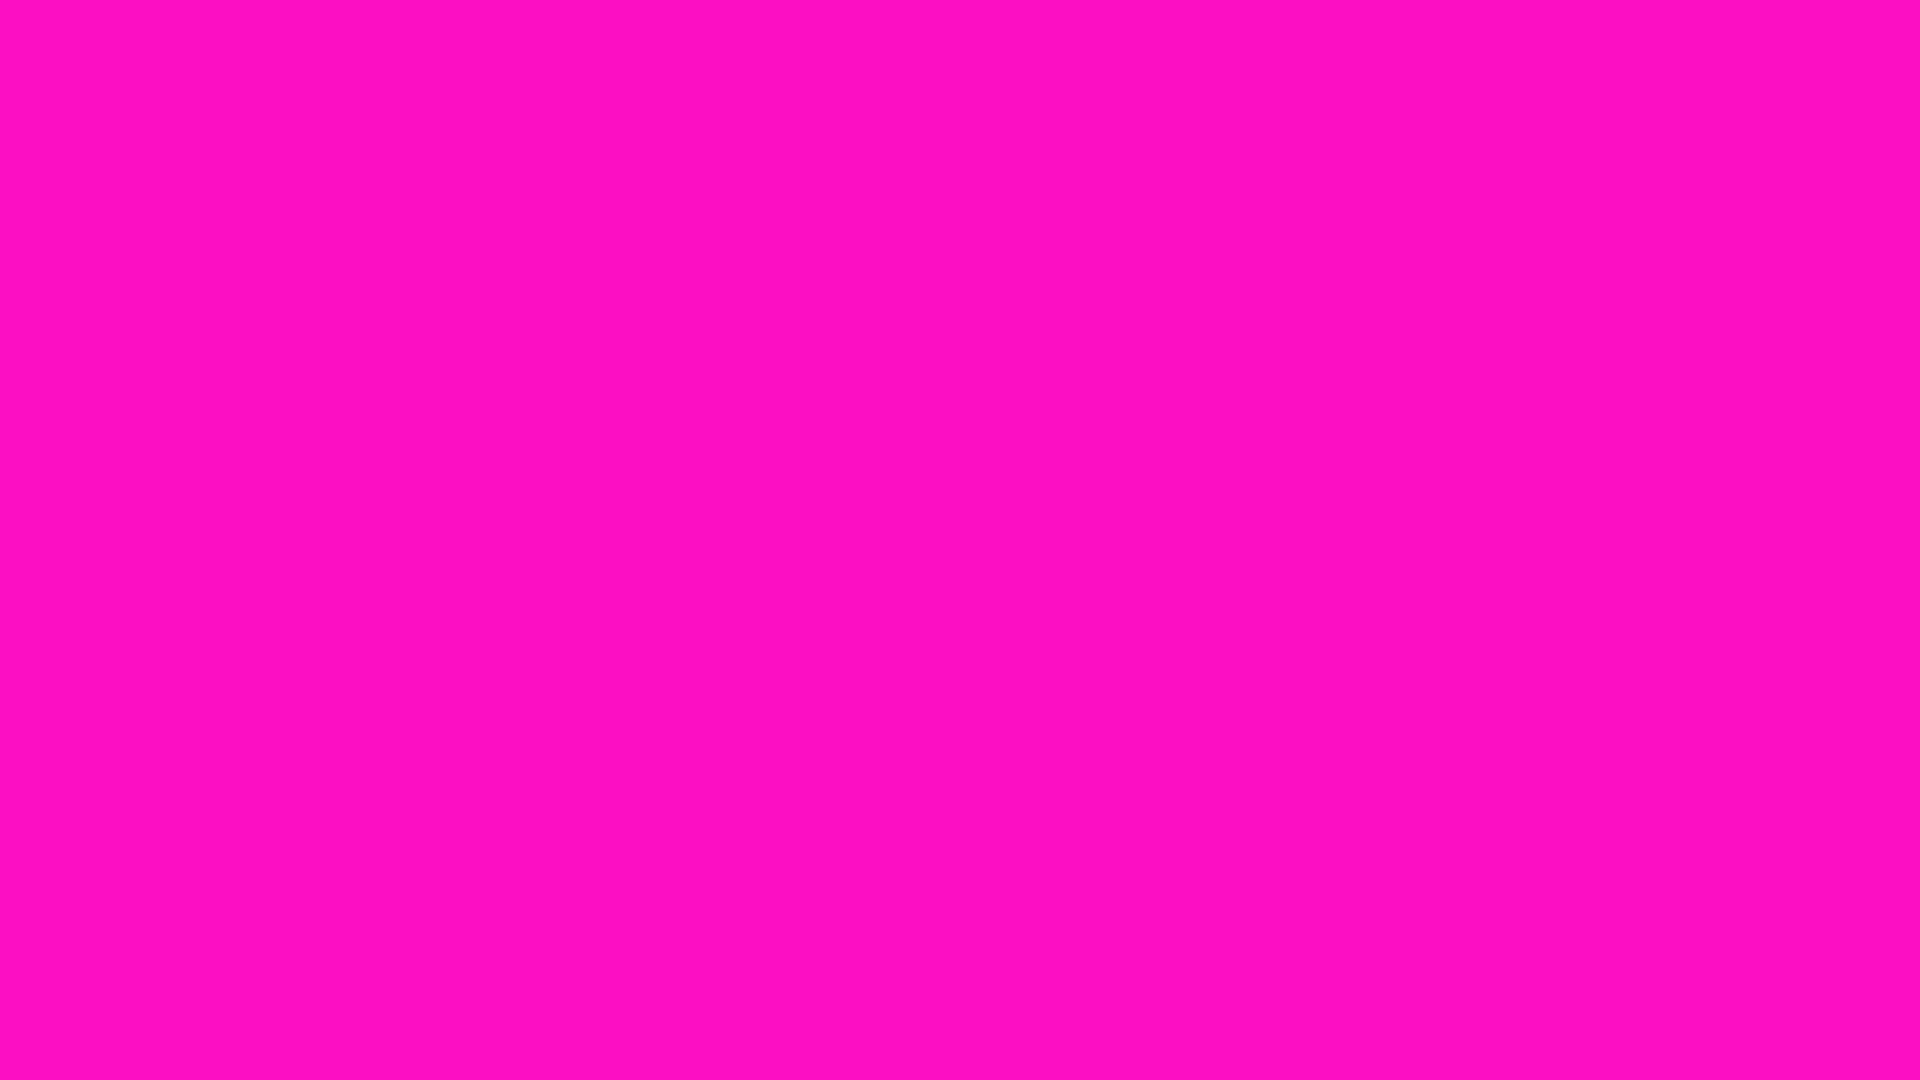 1920x1080 Shocking Pink Solid Color Background